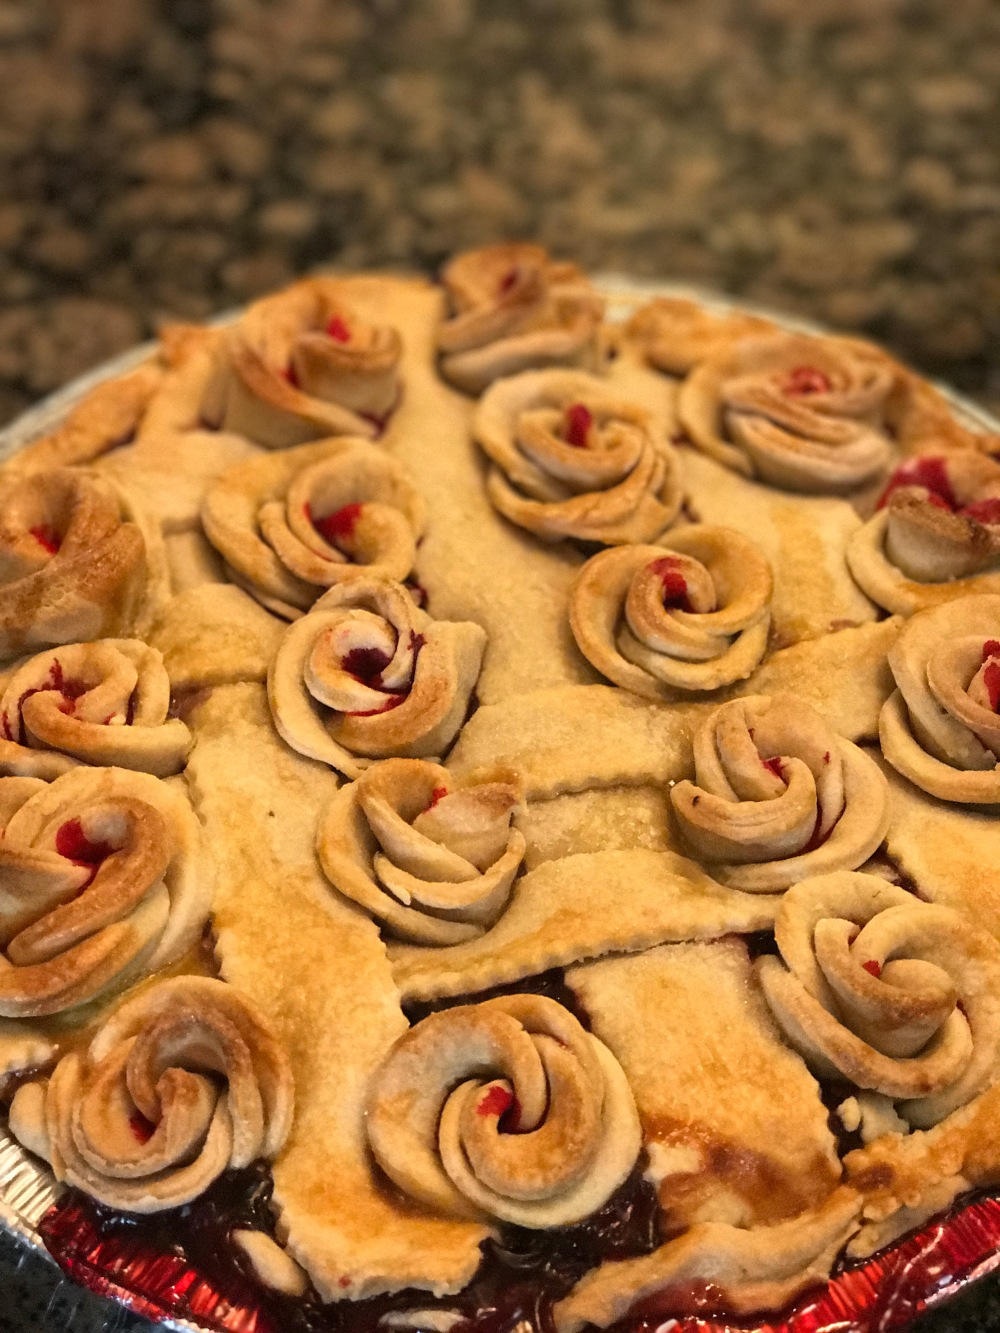 baked rose pie crust